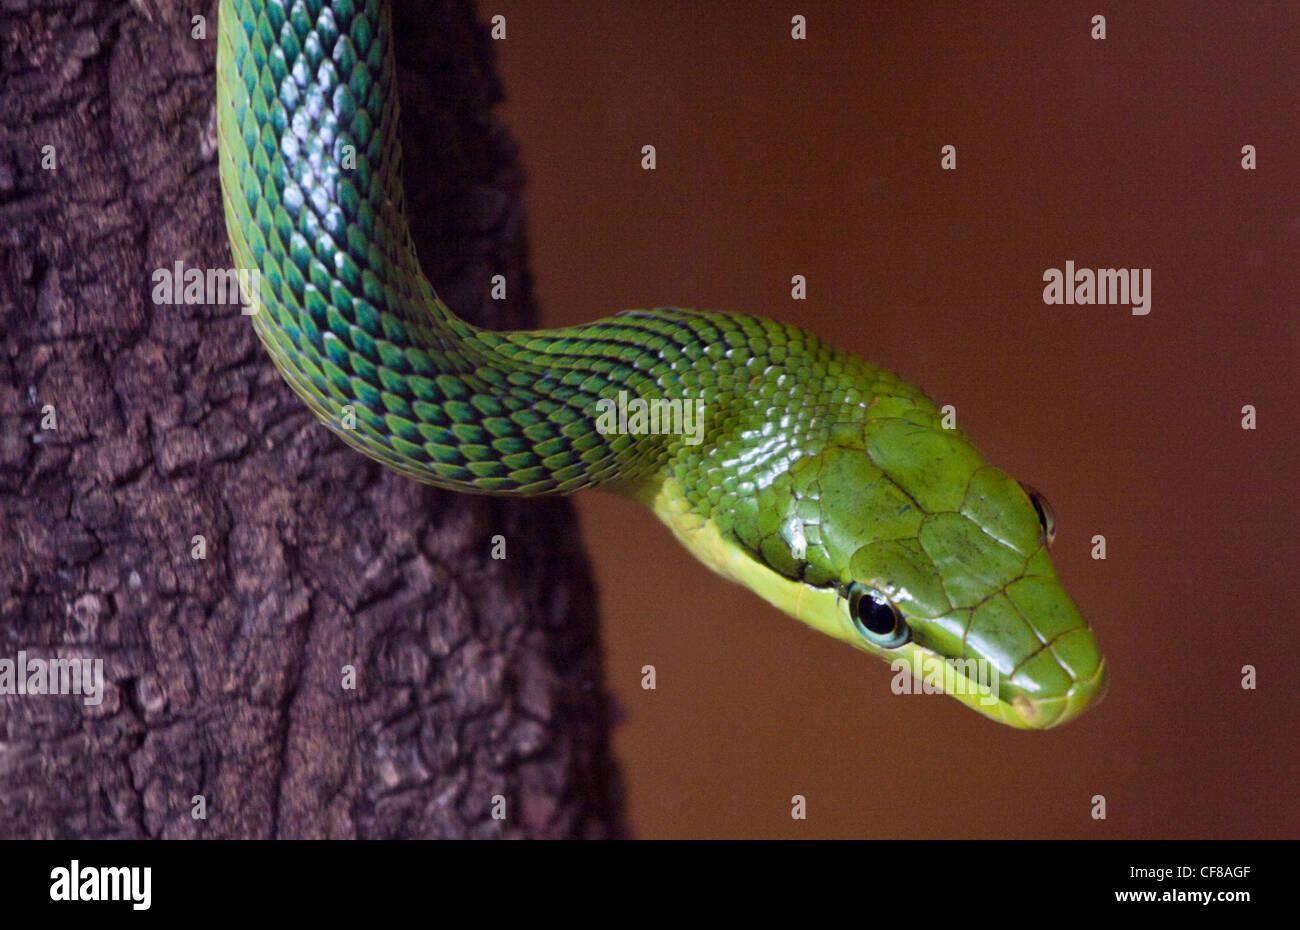 Rosso Verde codato Biacco (gonyosoma oxycephalum) Immagini Stock